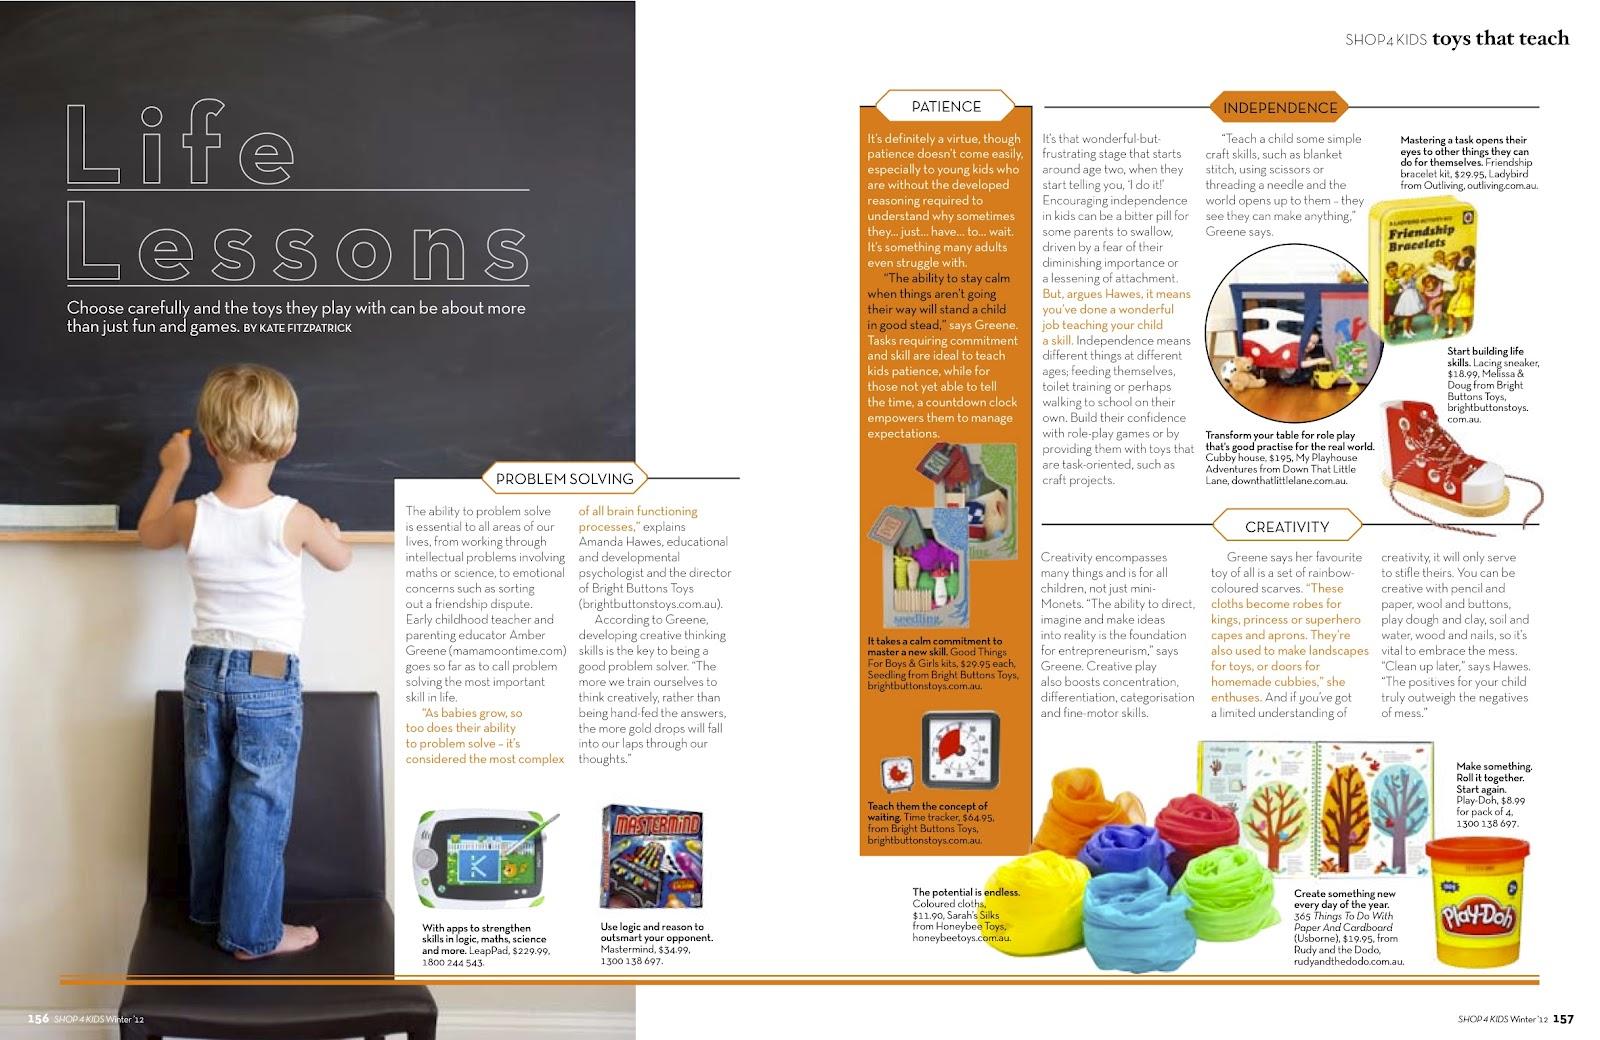 Toys Easter Magazine : Amber greene s toy suggestions on shop kids magazine